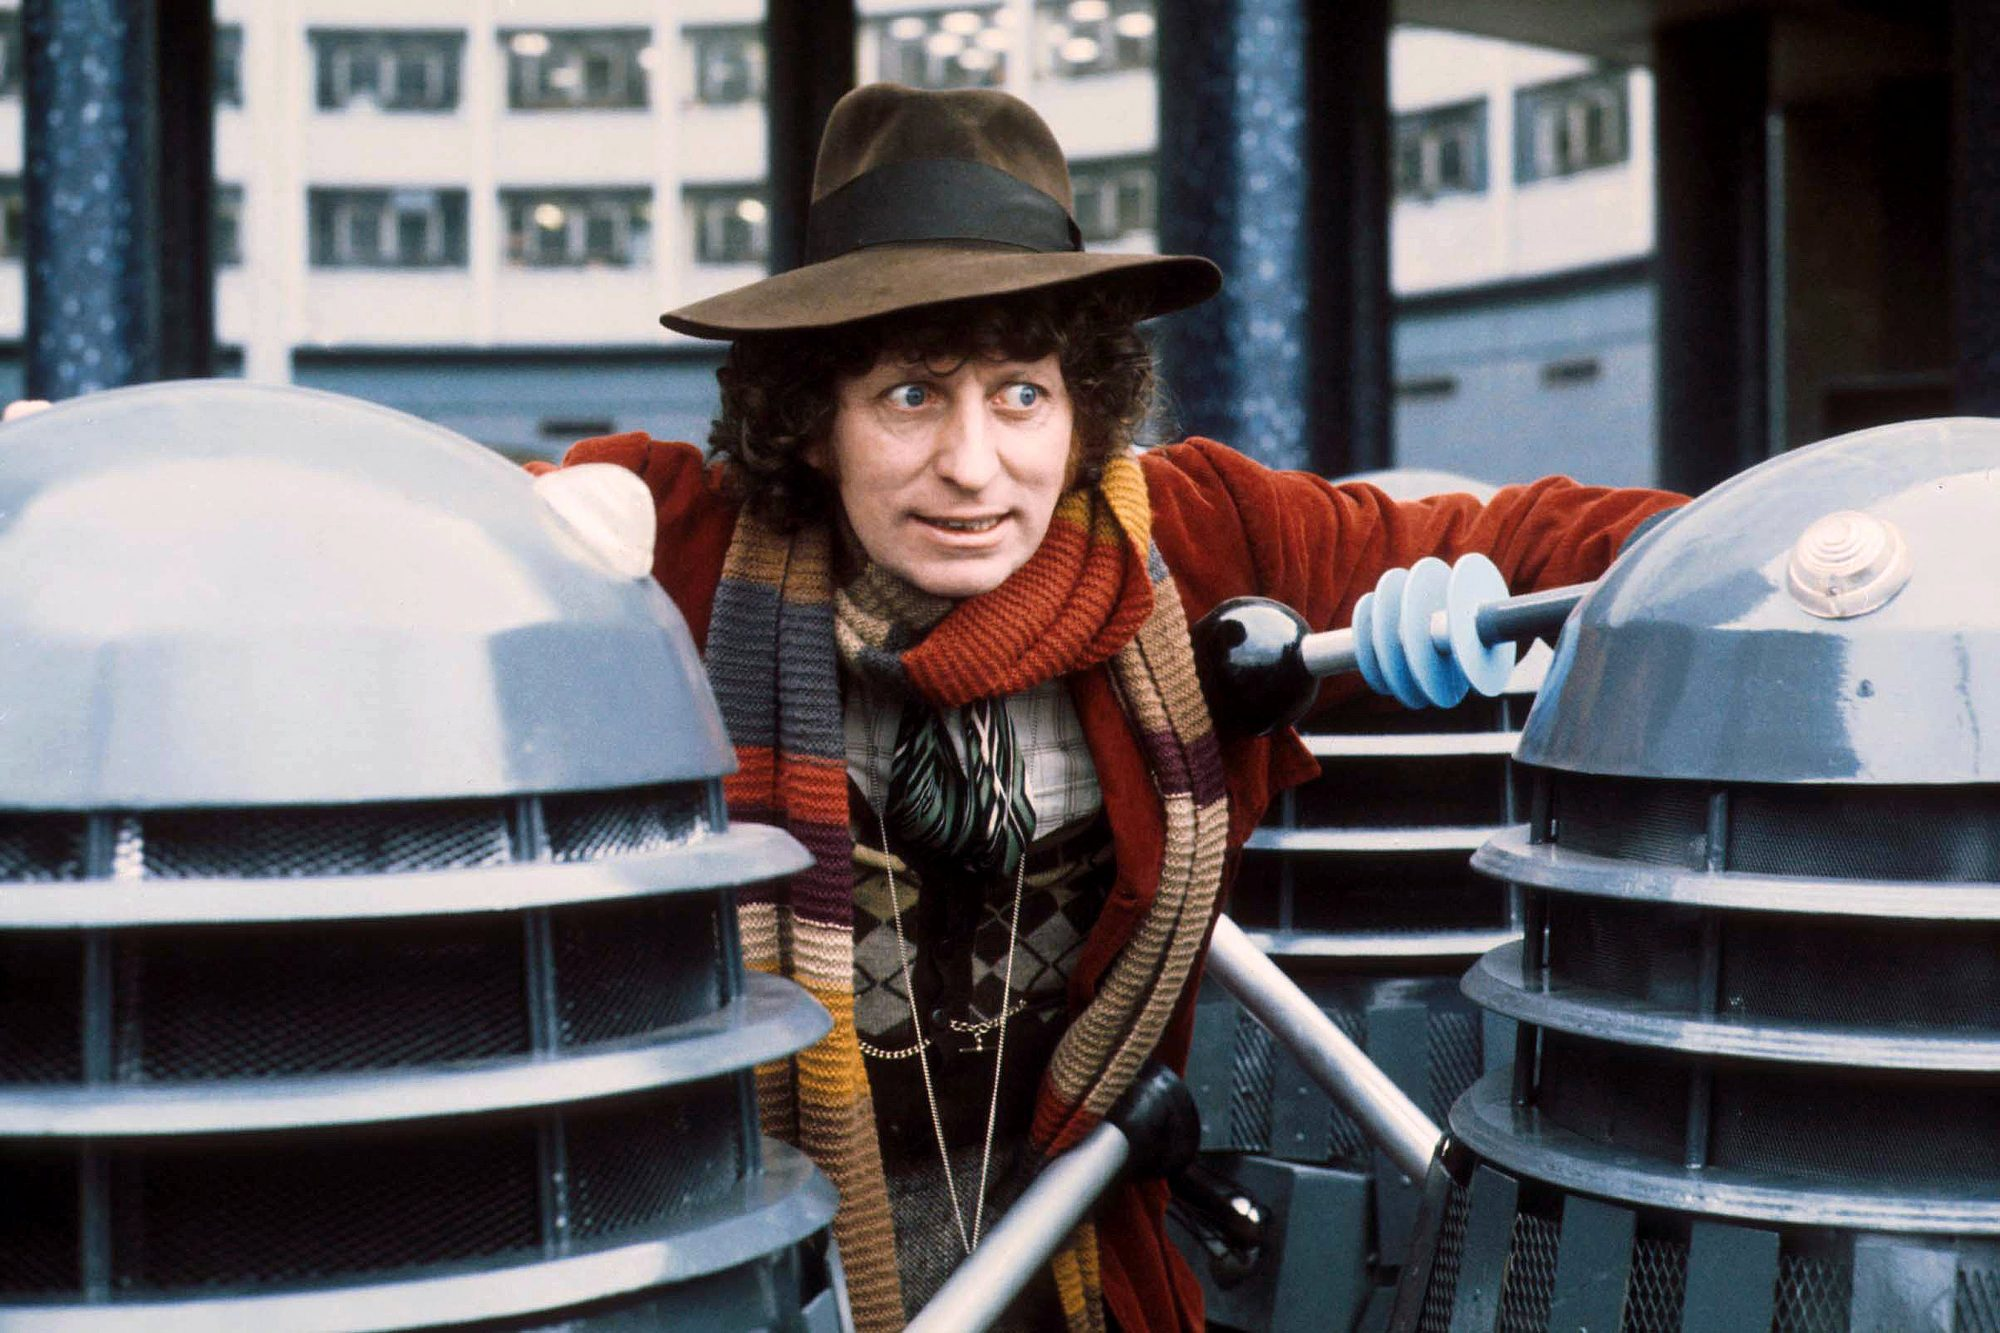 DOCTOR WHO, Tom Baker with Daleks, 1963-1989.